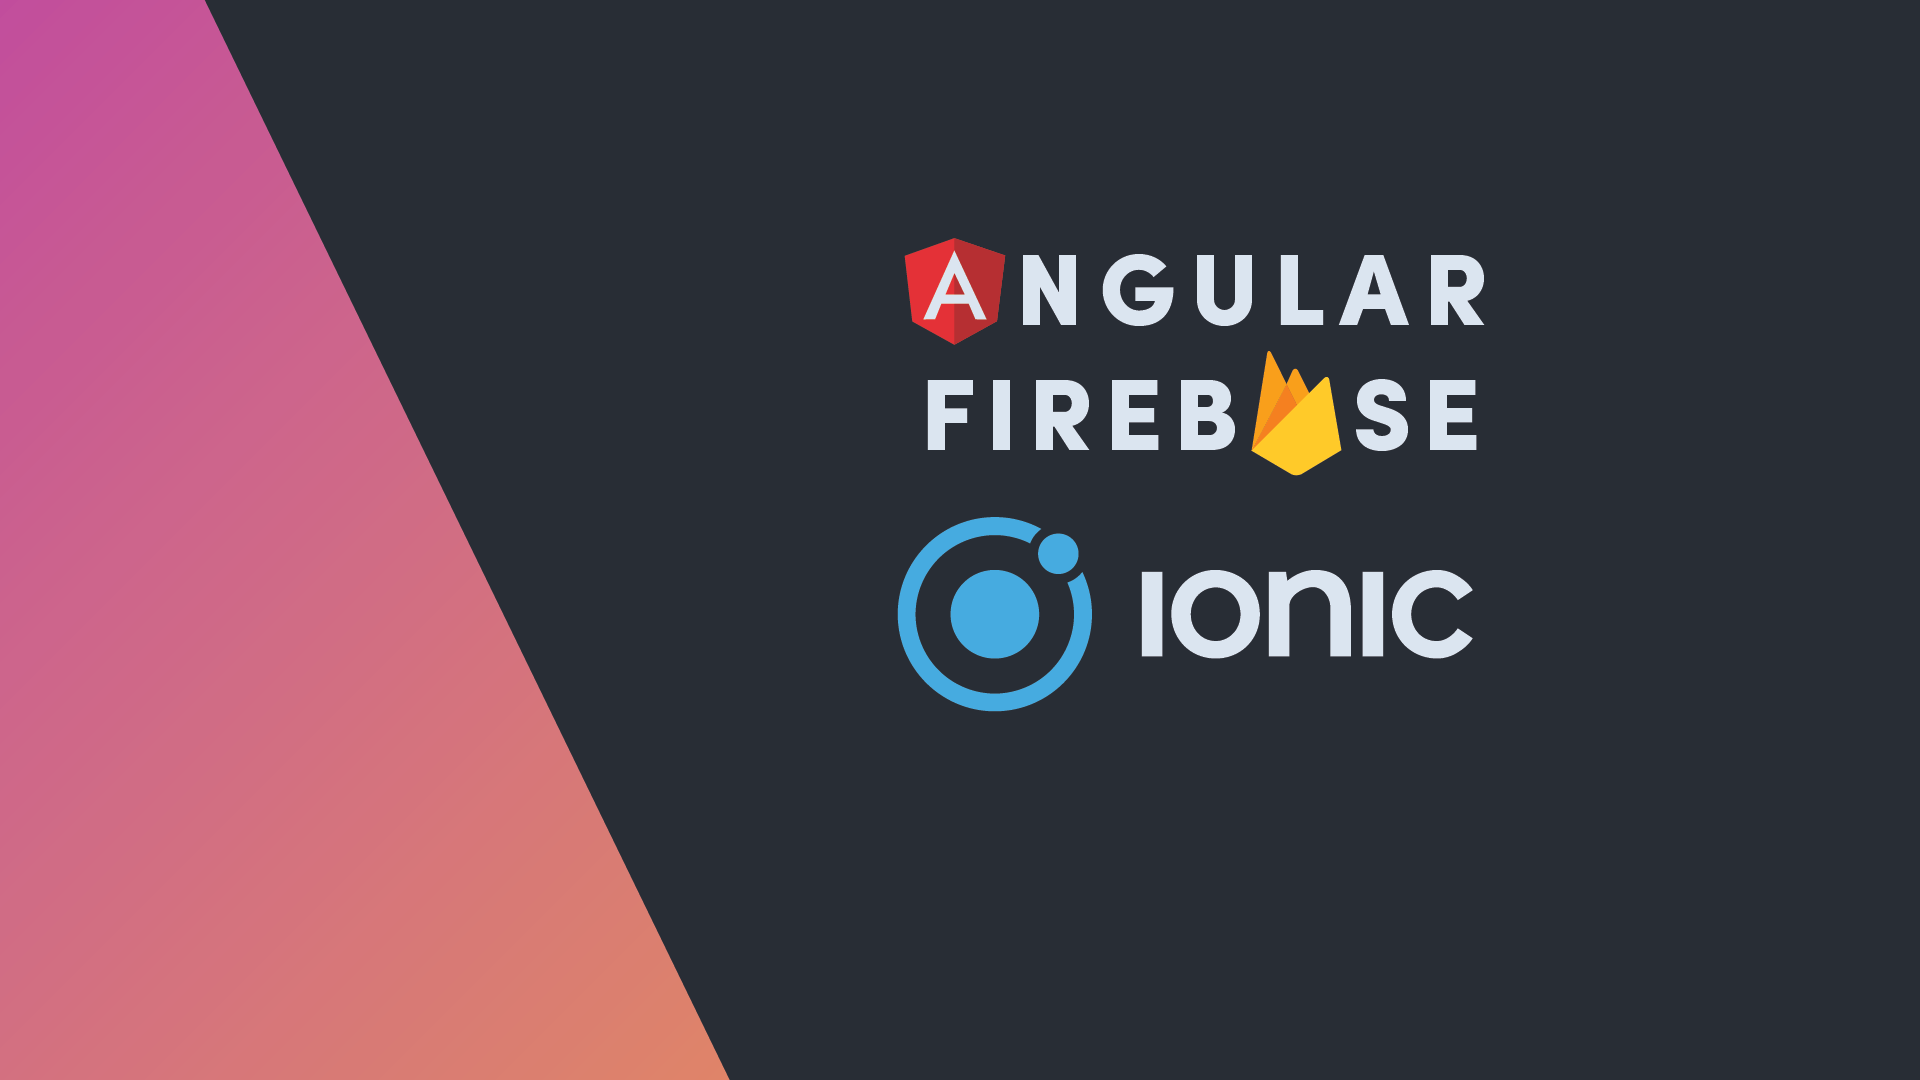 Ionic Native with Firebase | Angular Firebase